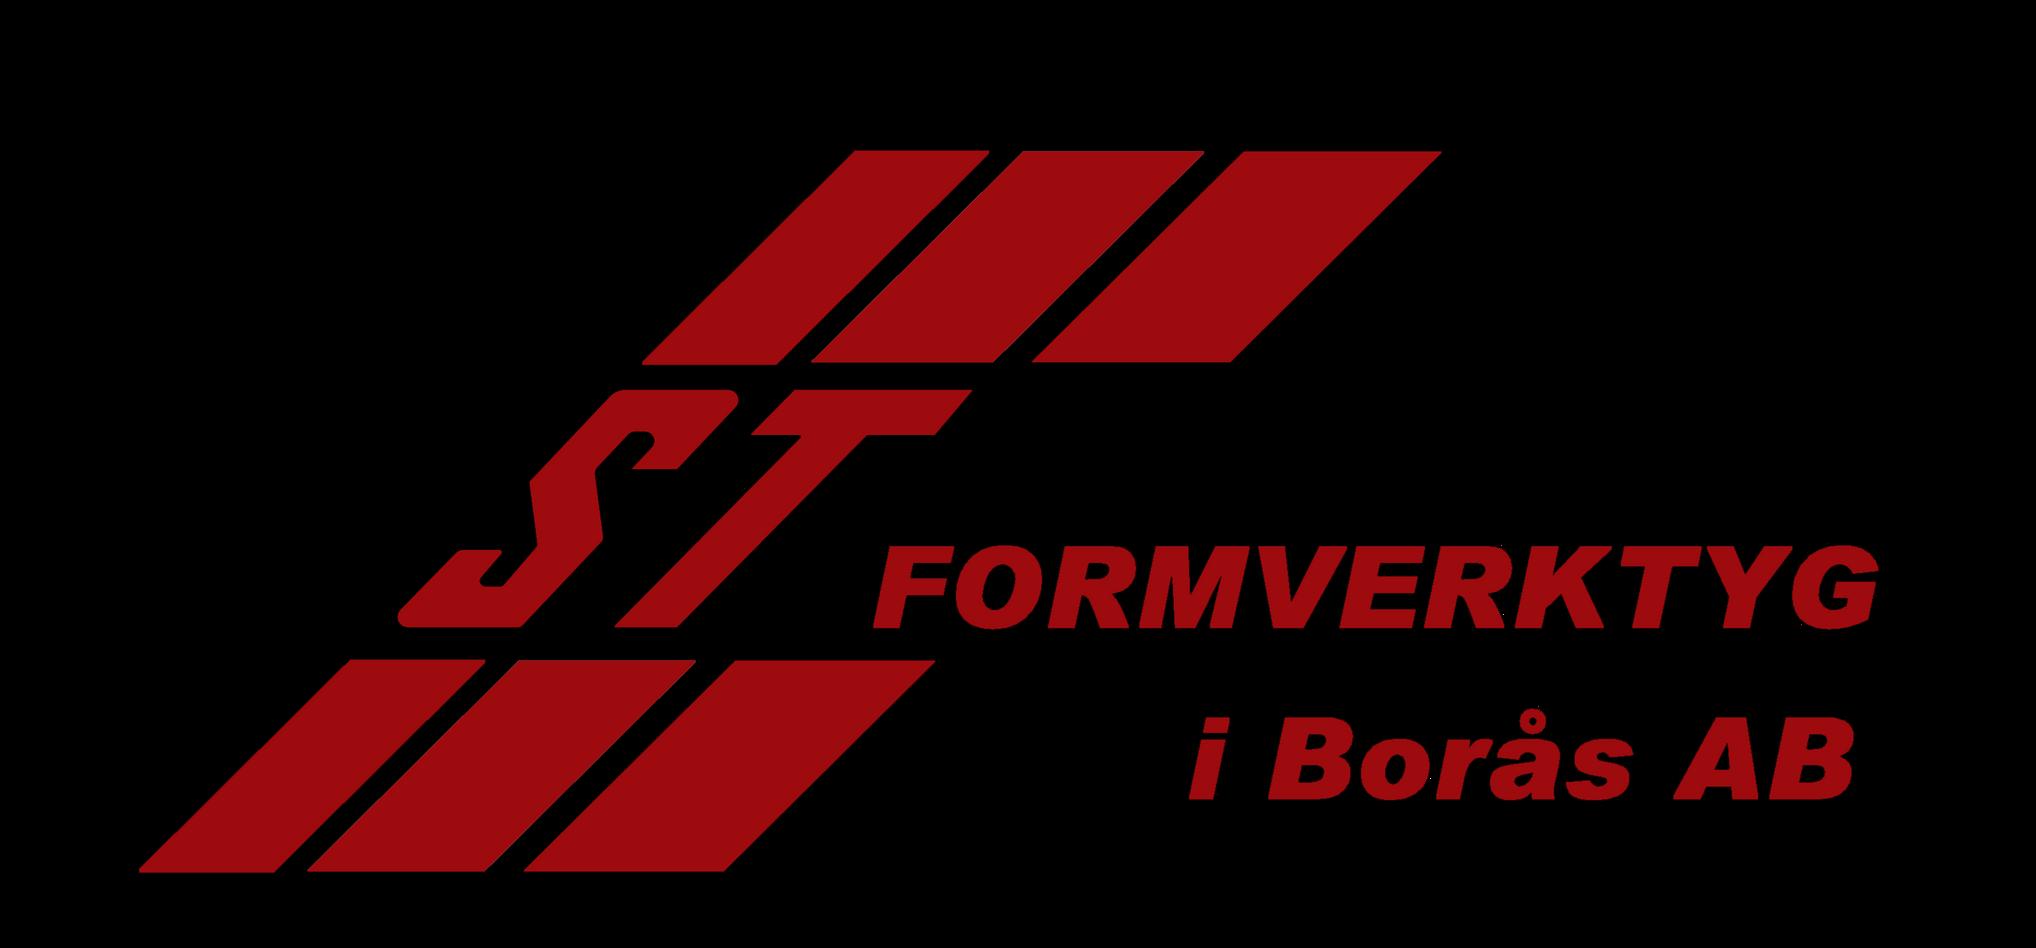 ST Formverktyg